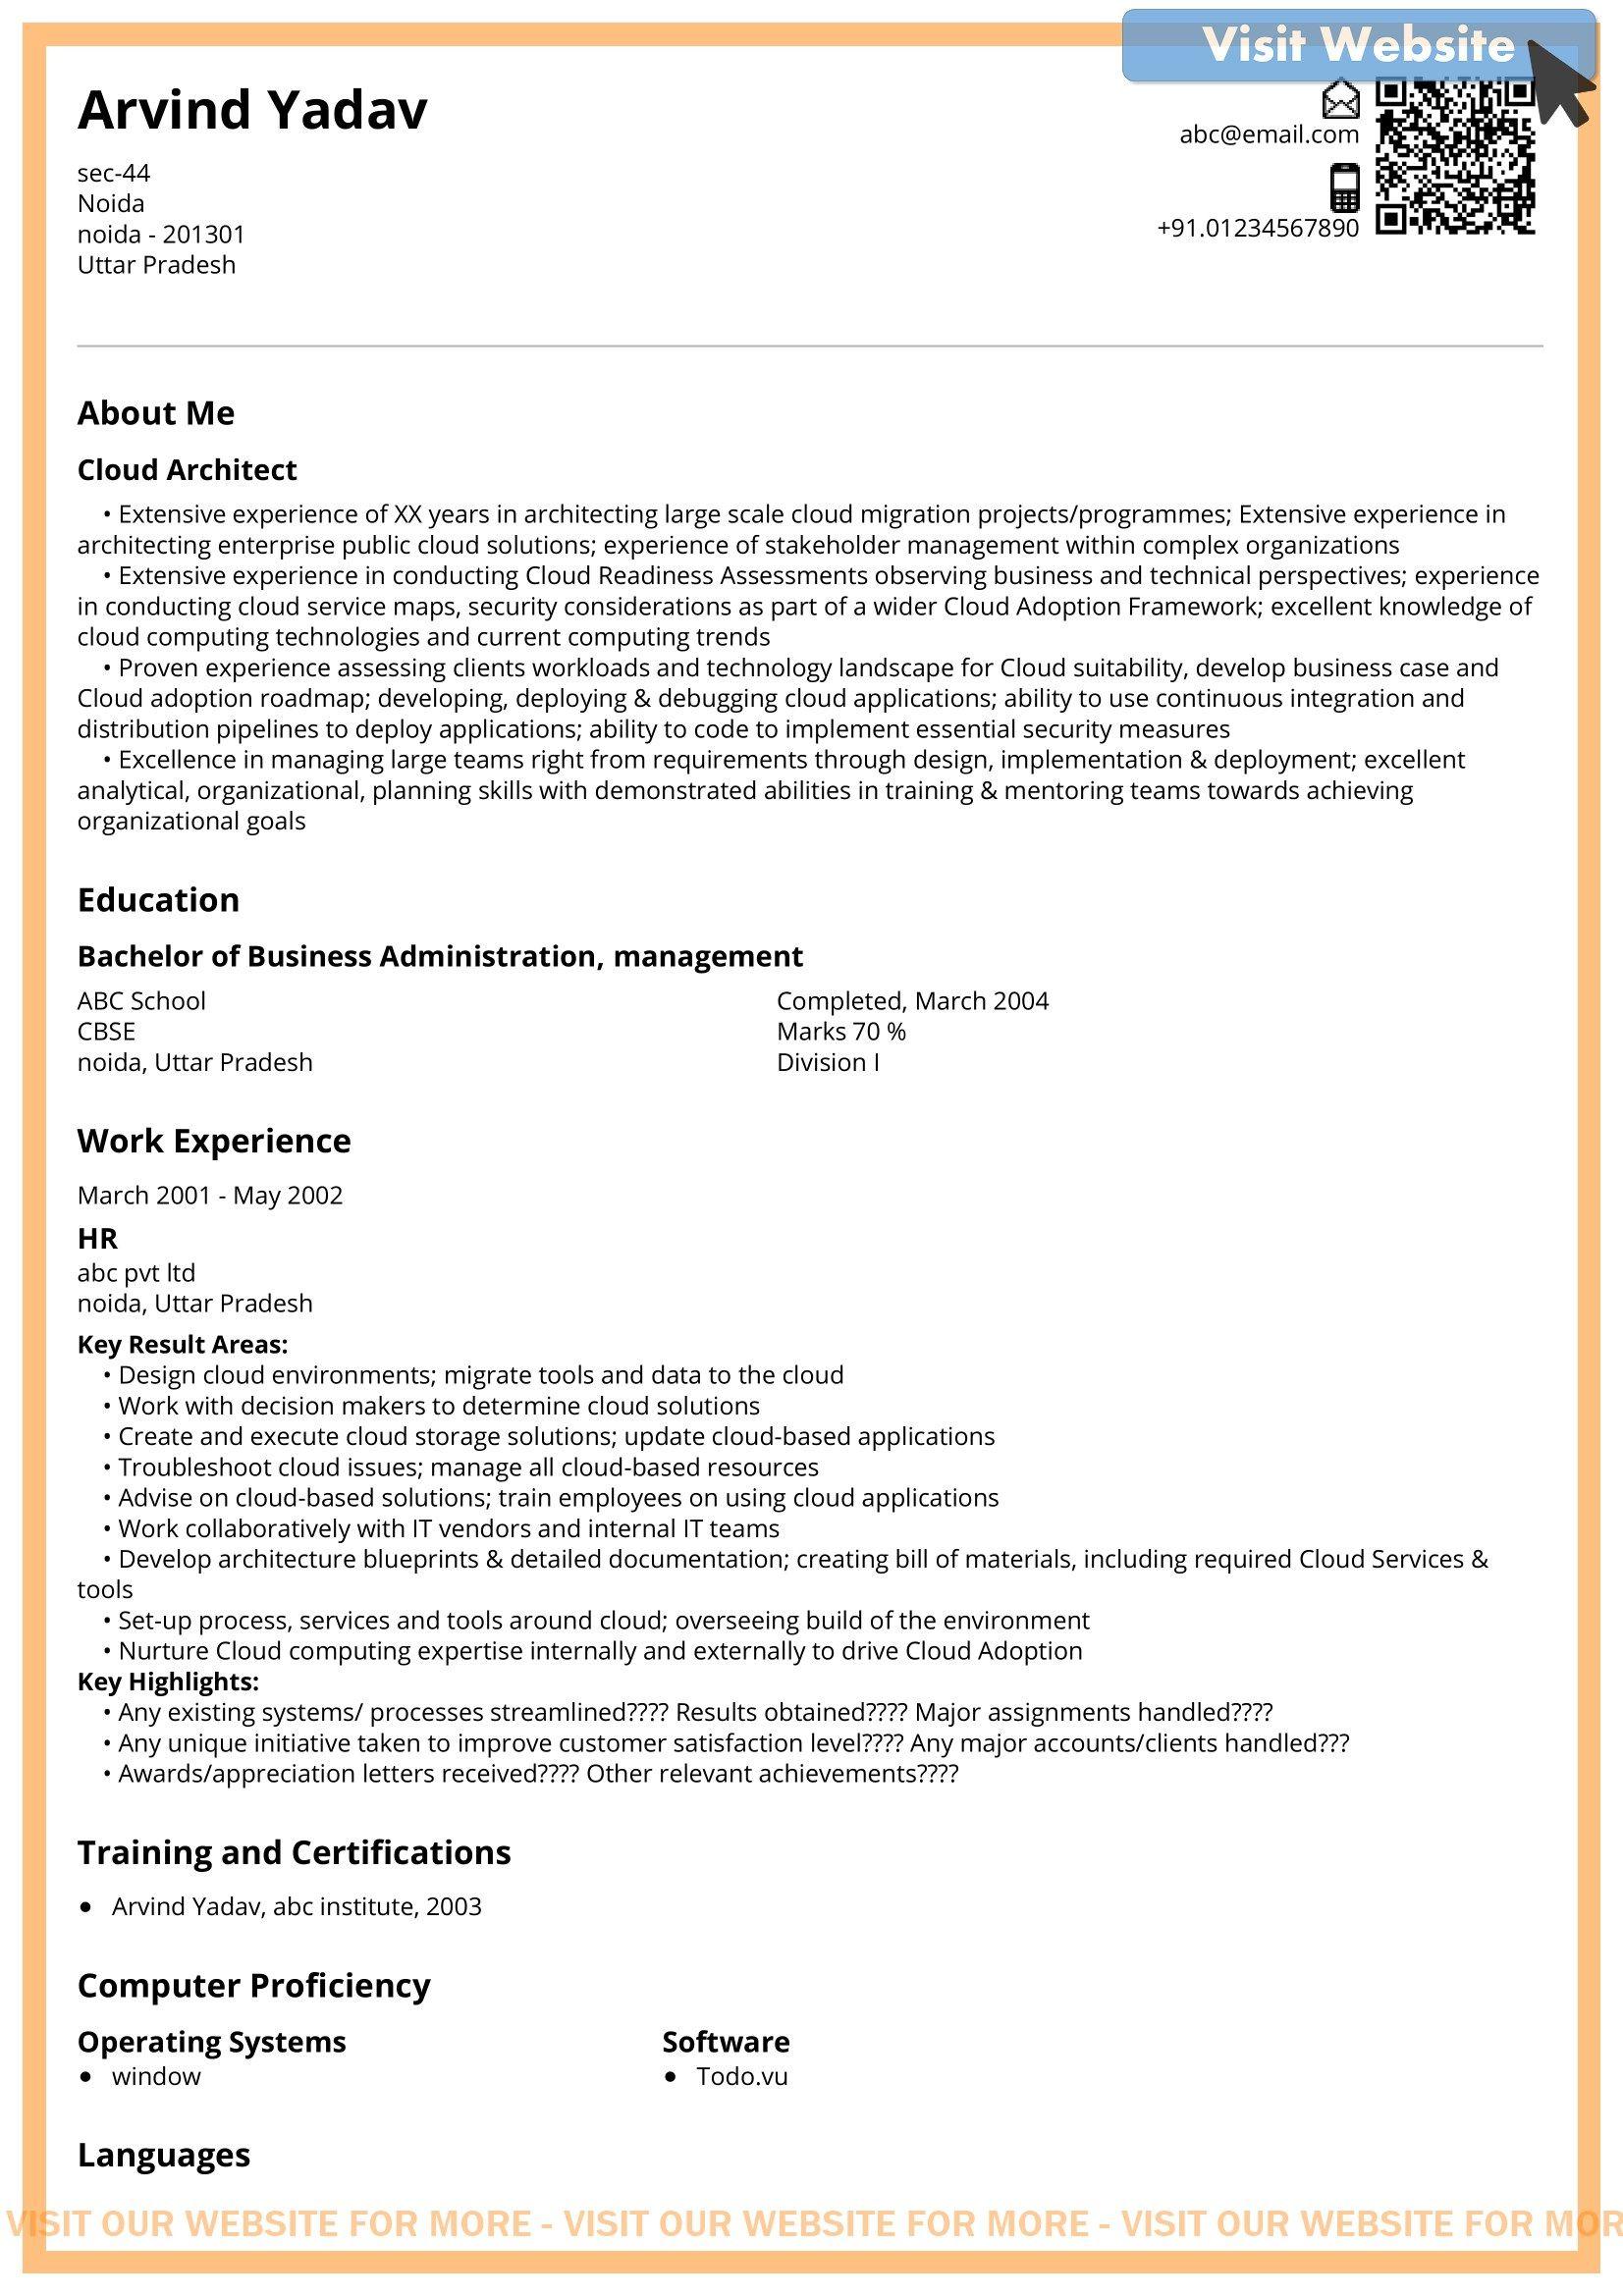 Civil engineering resume cover letter